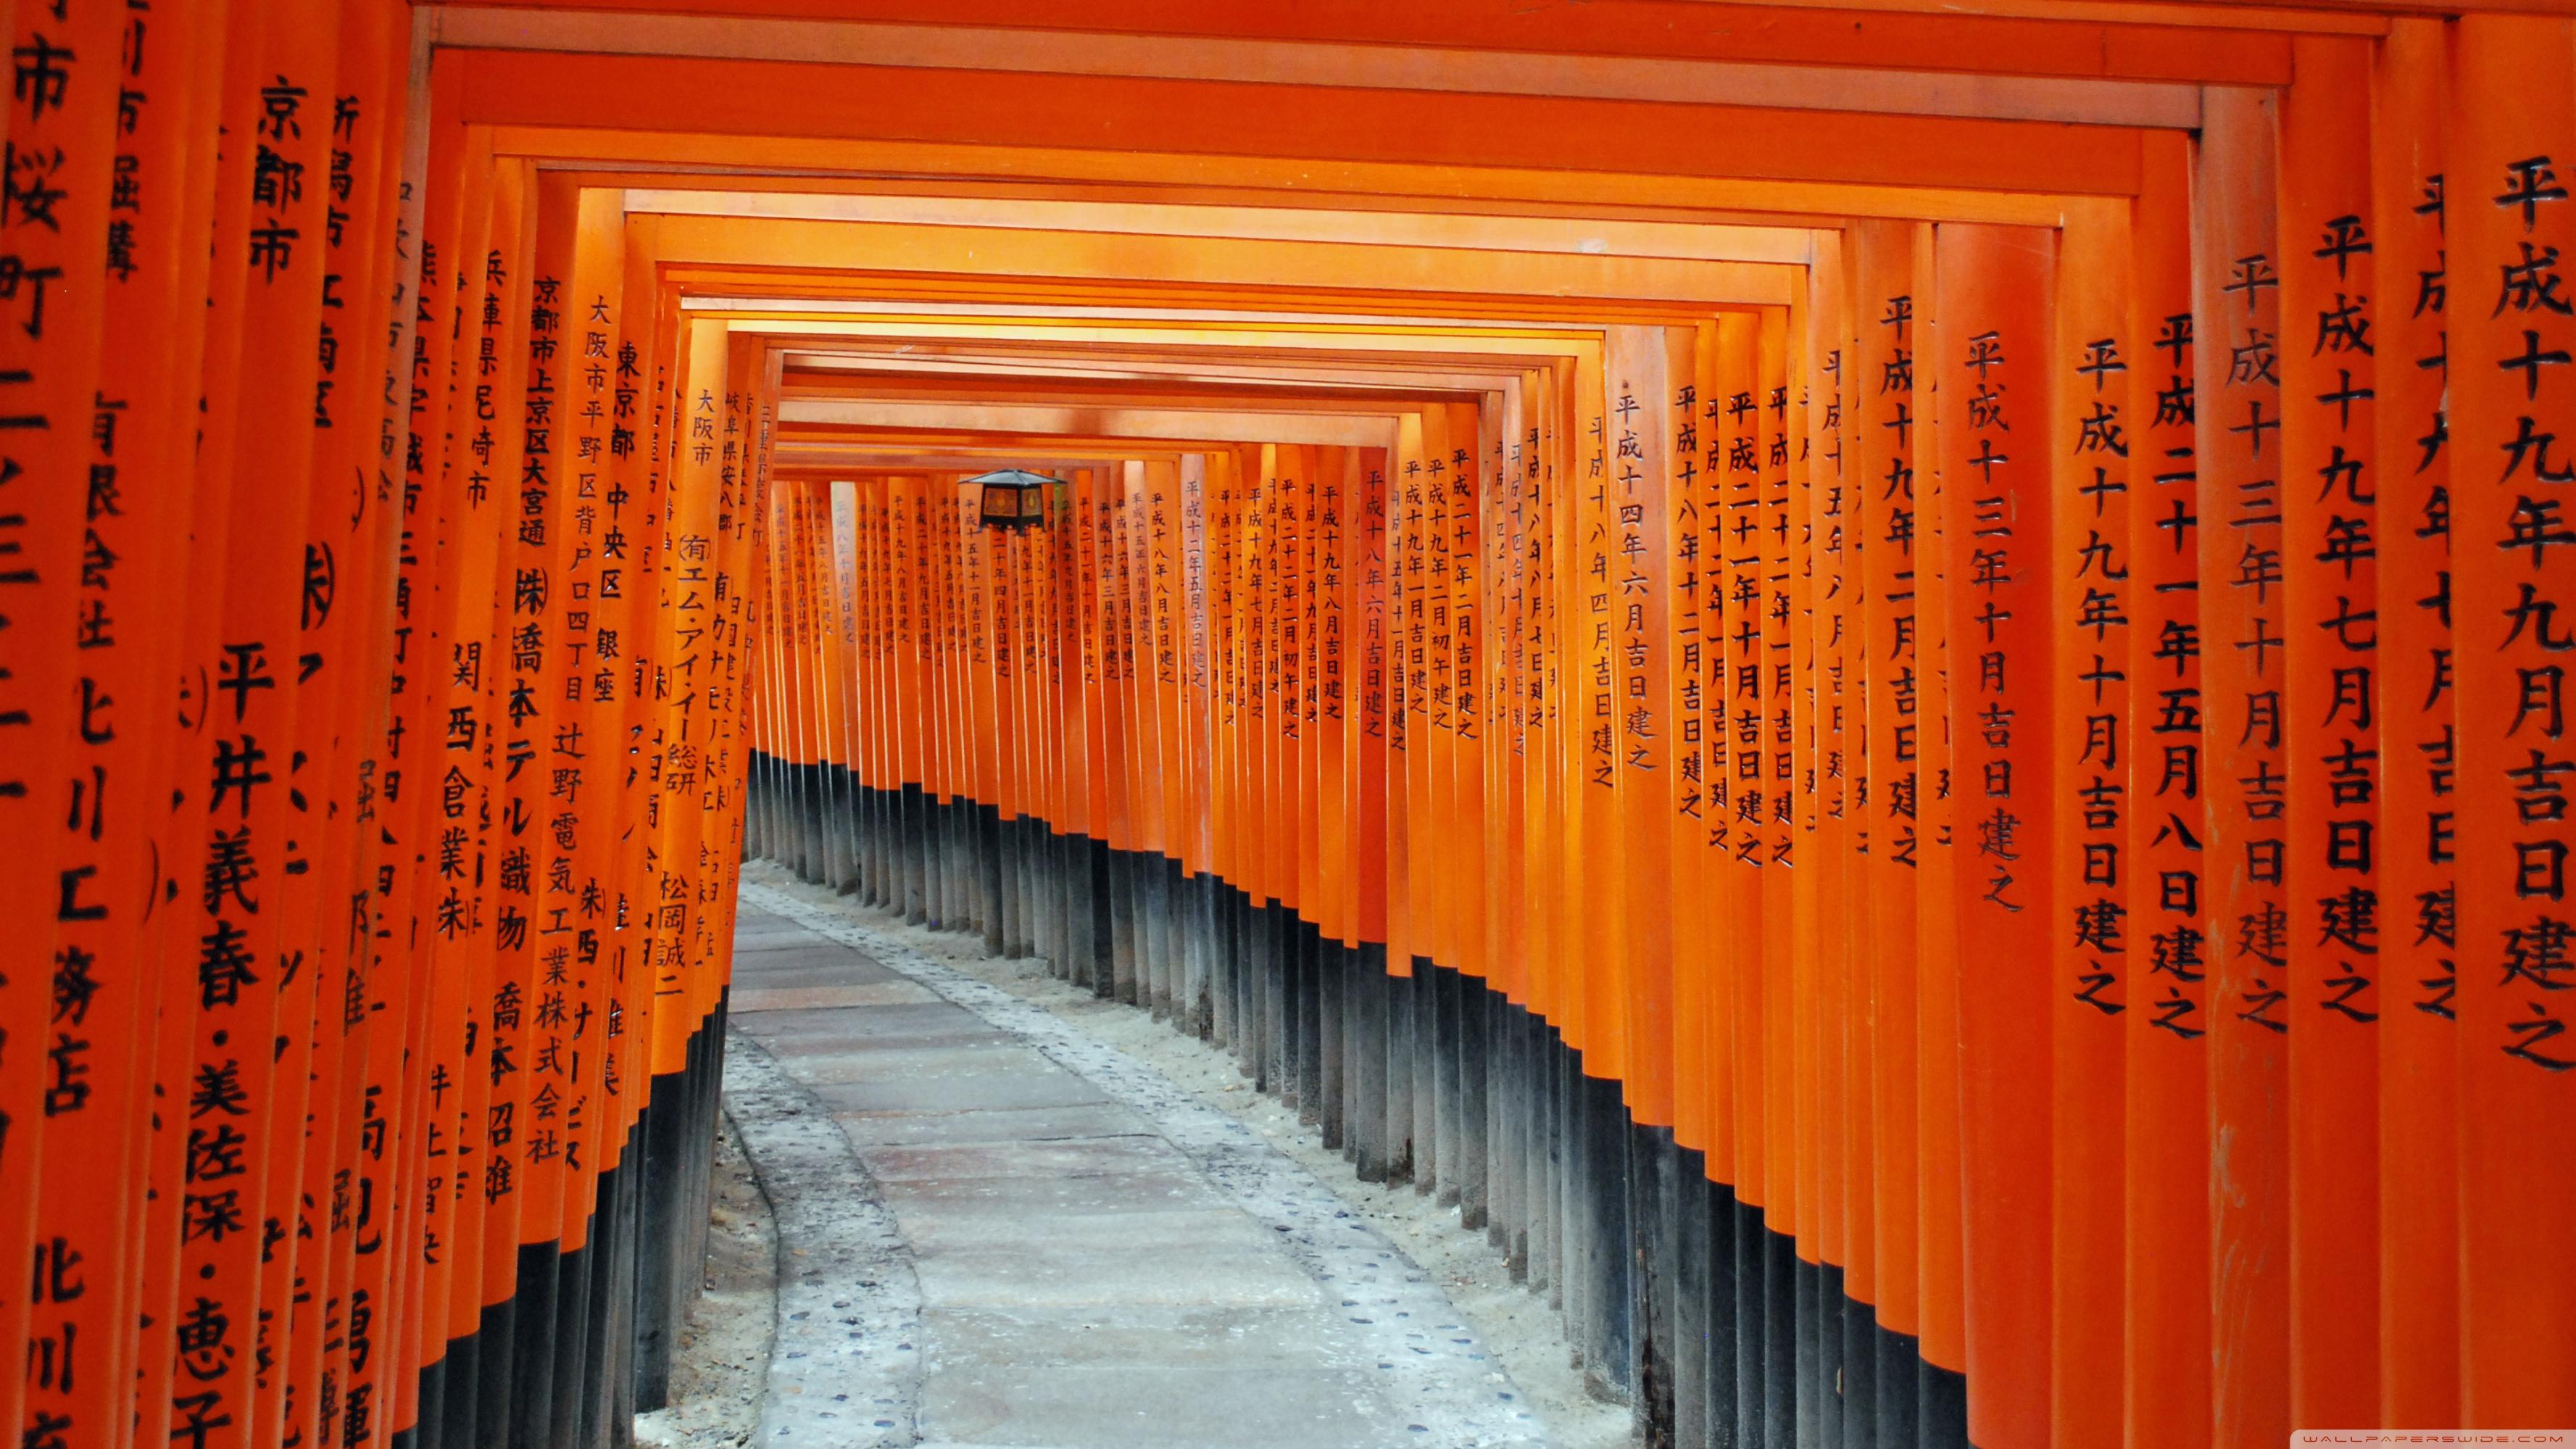 Fushimi Inari Taisha Kyoto Japan 4K HD Desktop Wallpaper for 3554x1999